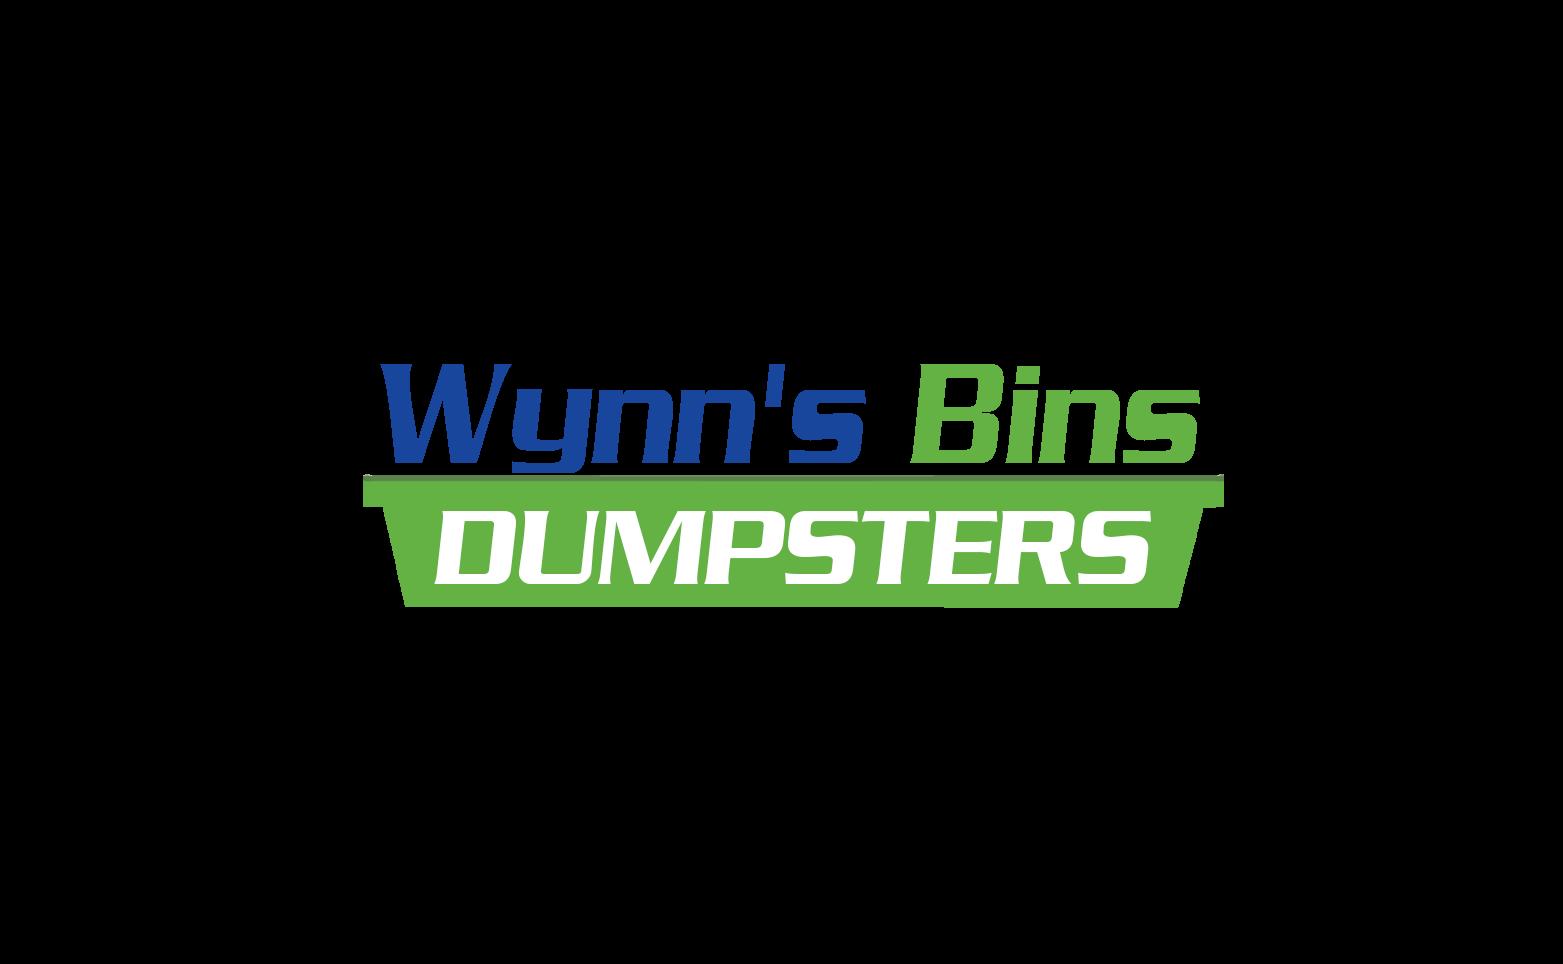 Dumpster rental comany